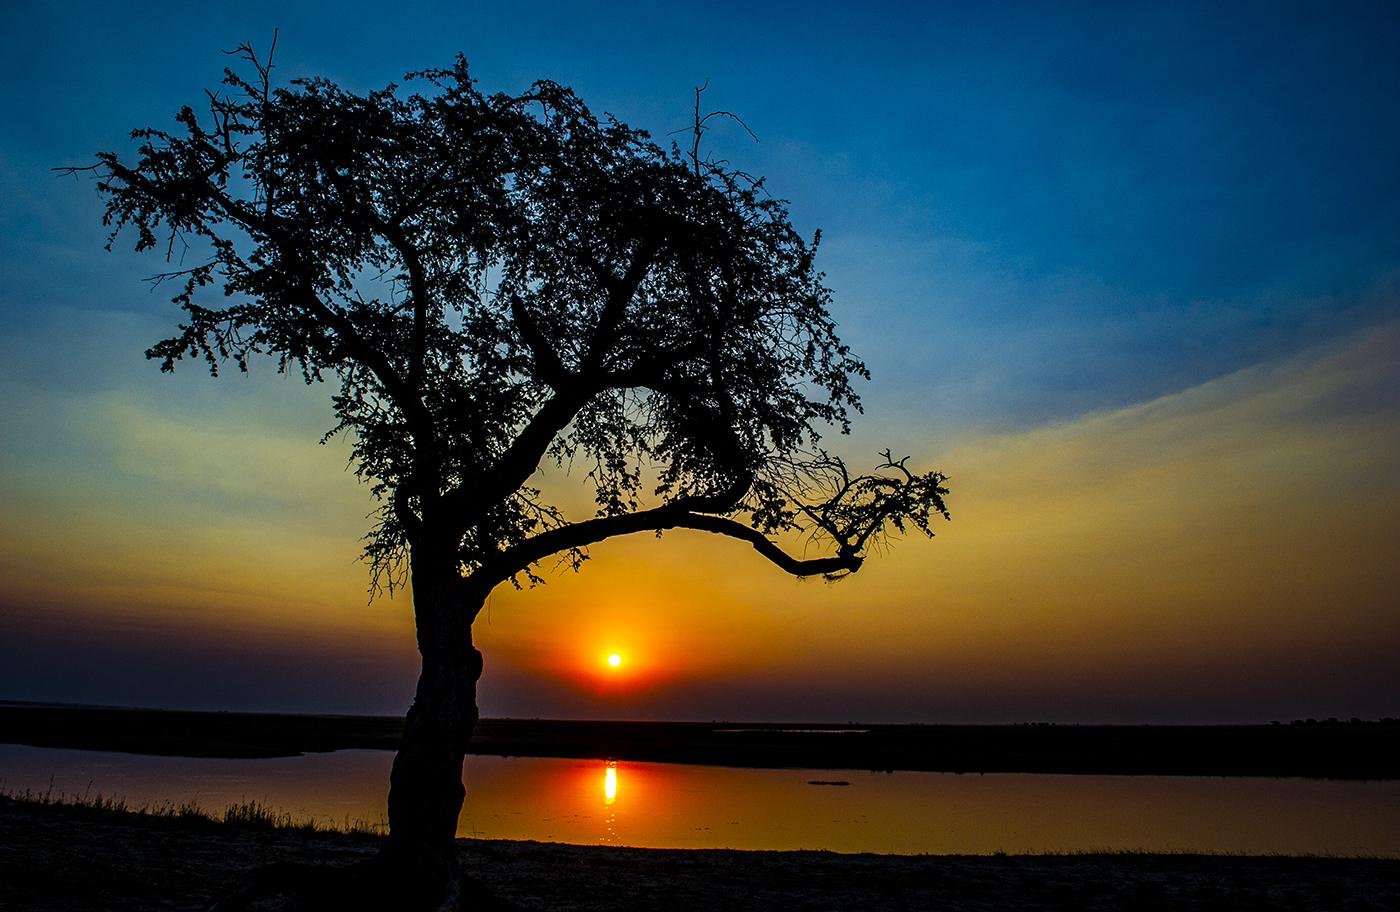 Sun set in Africa